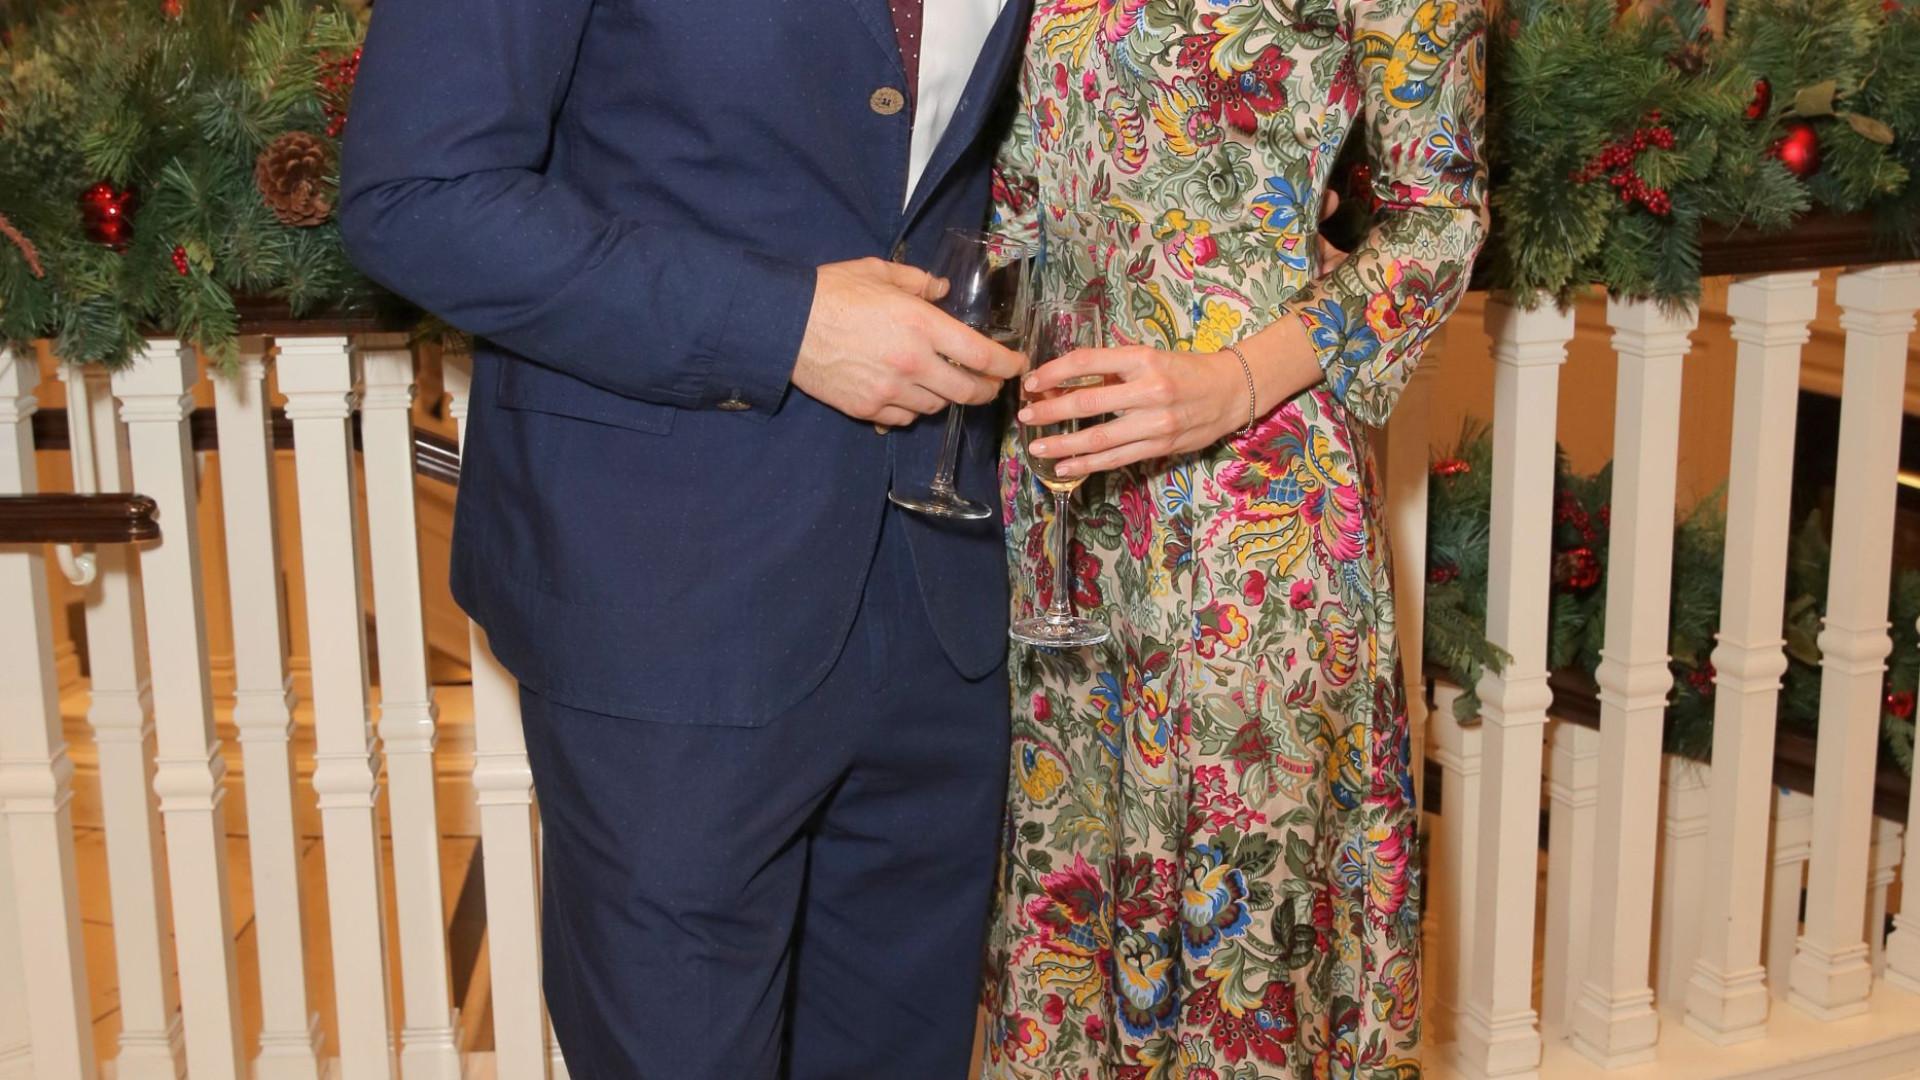 Ator Allen Leech casou-se com Jessica Blair Herman